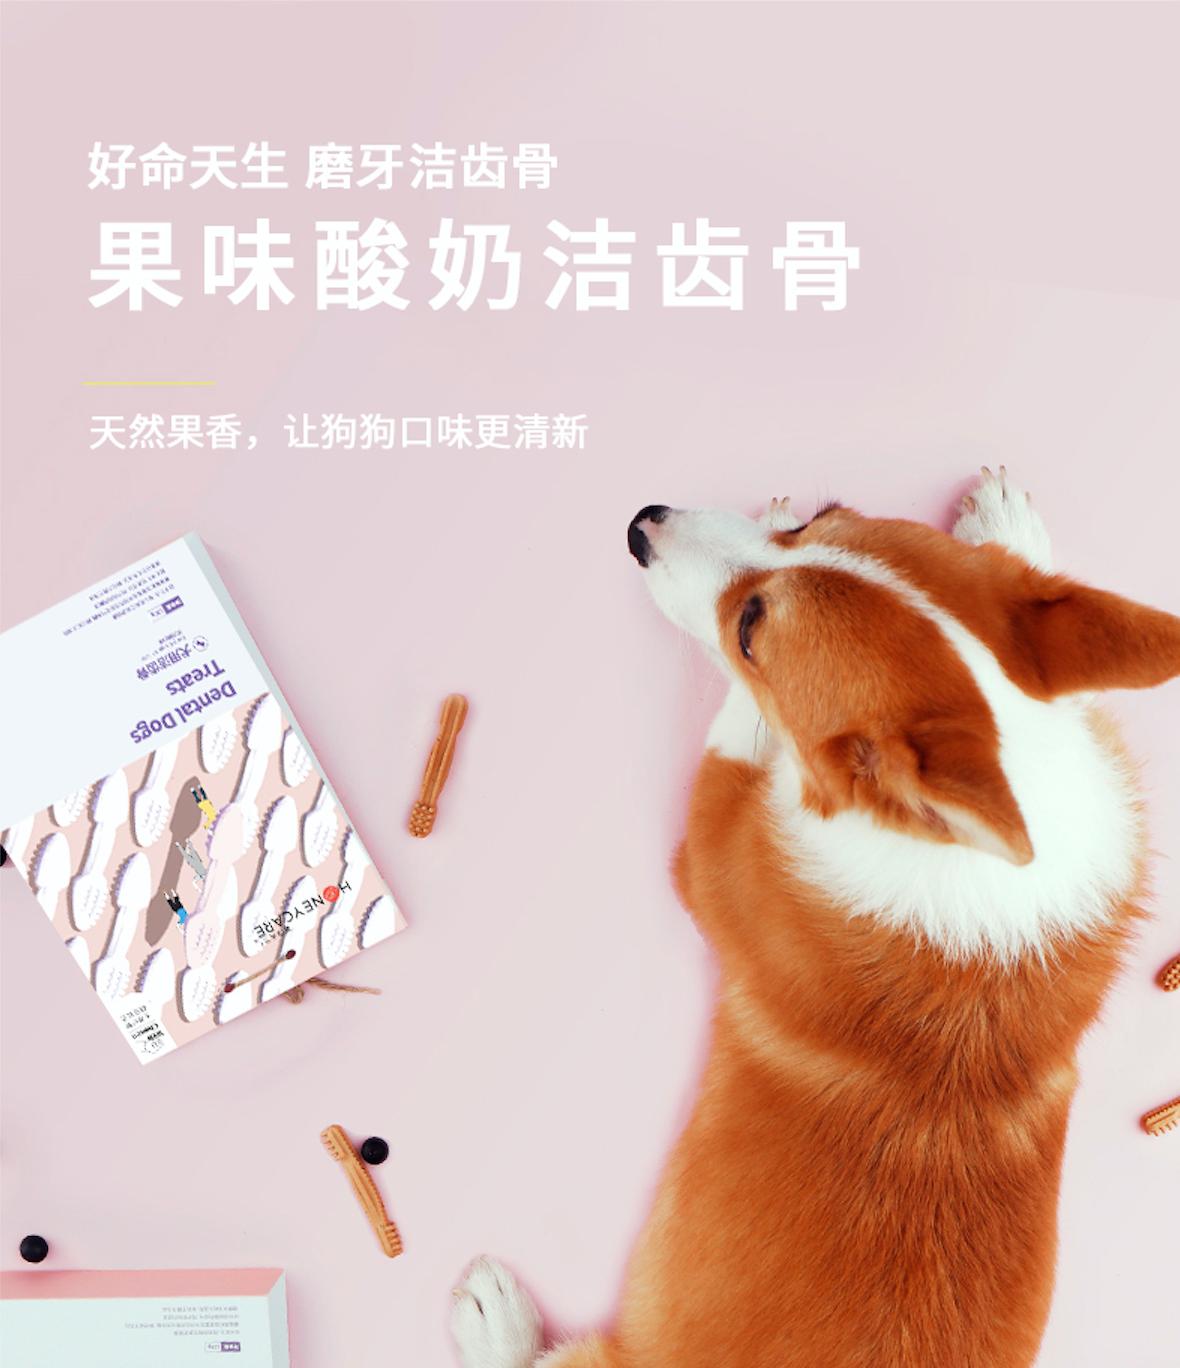 Honeycare【天生好命】Berry Yogurt Dental Sticks / Oral Care Chews / Dog Treats 120g